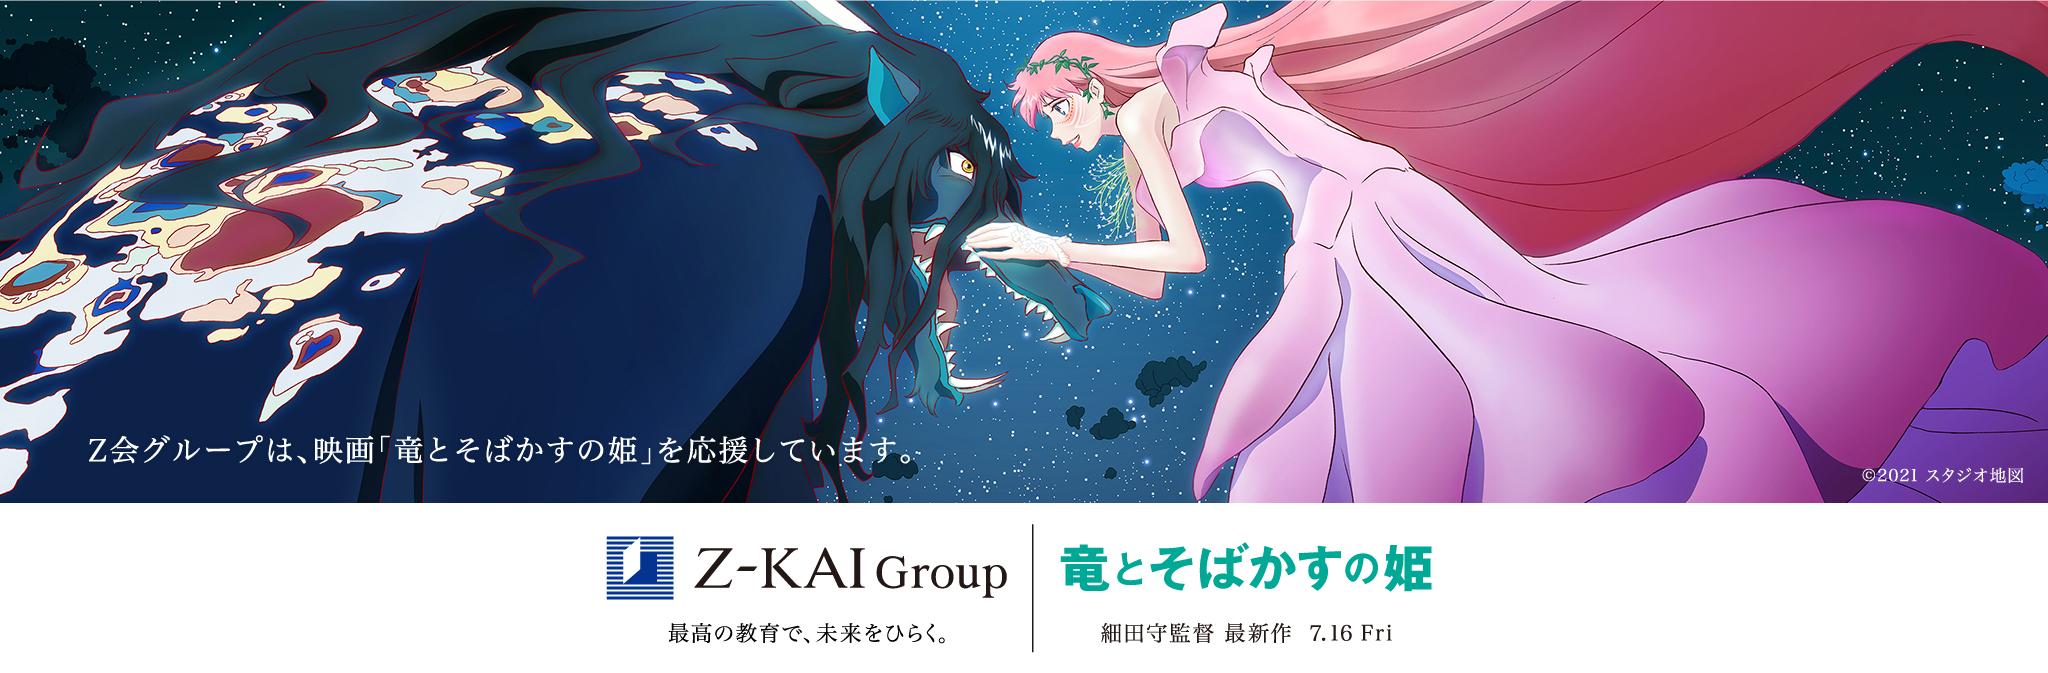 Z会グループ|7月16日公開、スタジオ地図・細田守監督最新作映画『竜とそばかすの姫』タイアップCM